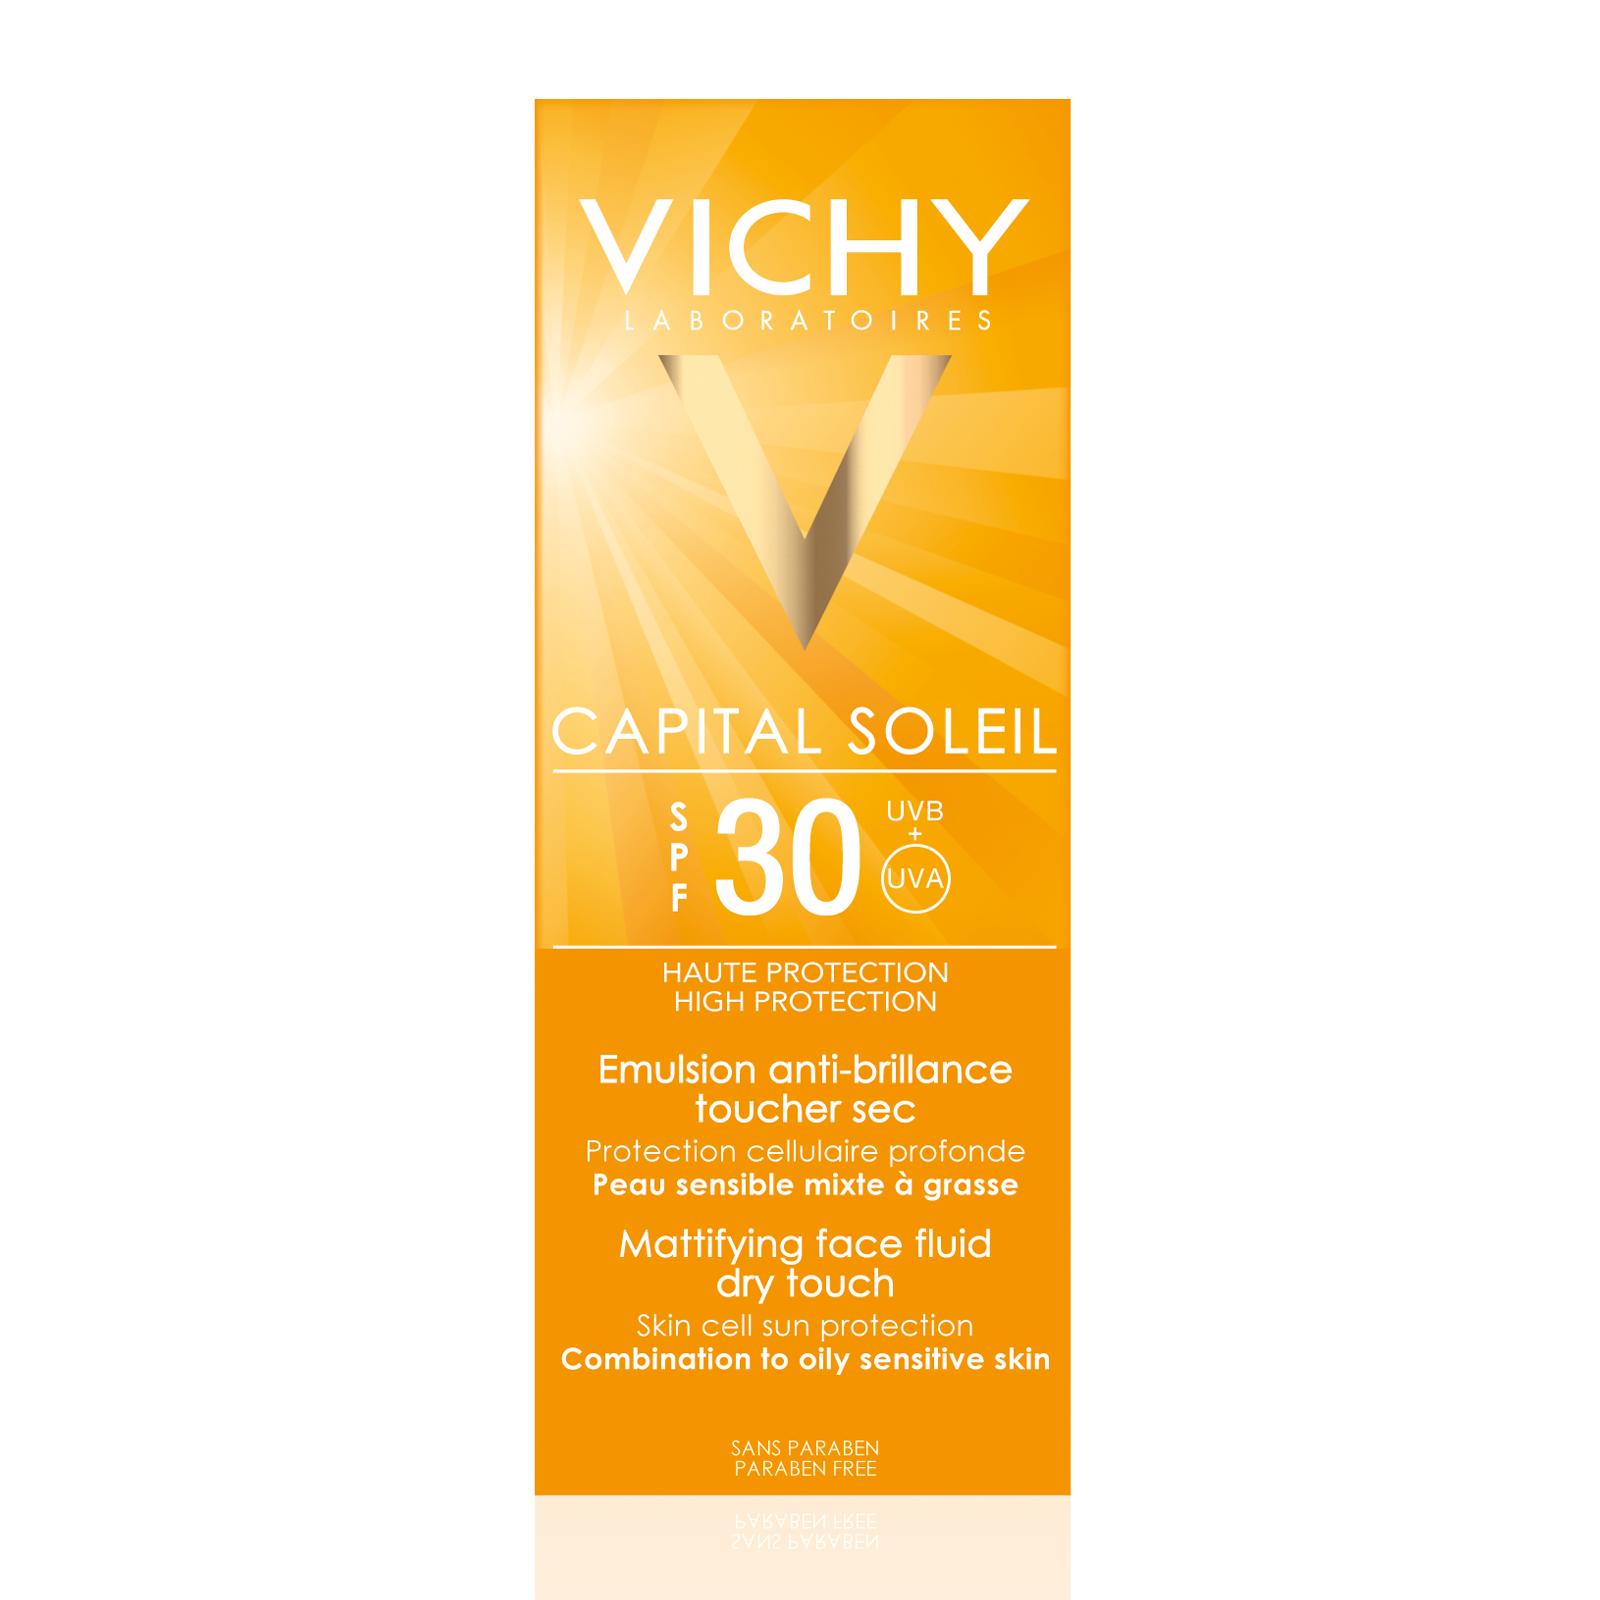 Vichy_Capital_Soleil_Face_Dry_Touch_SPF30_50ml_1392725777